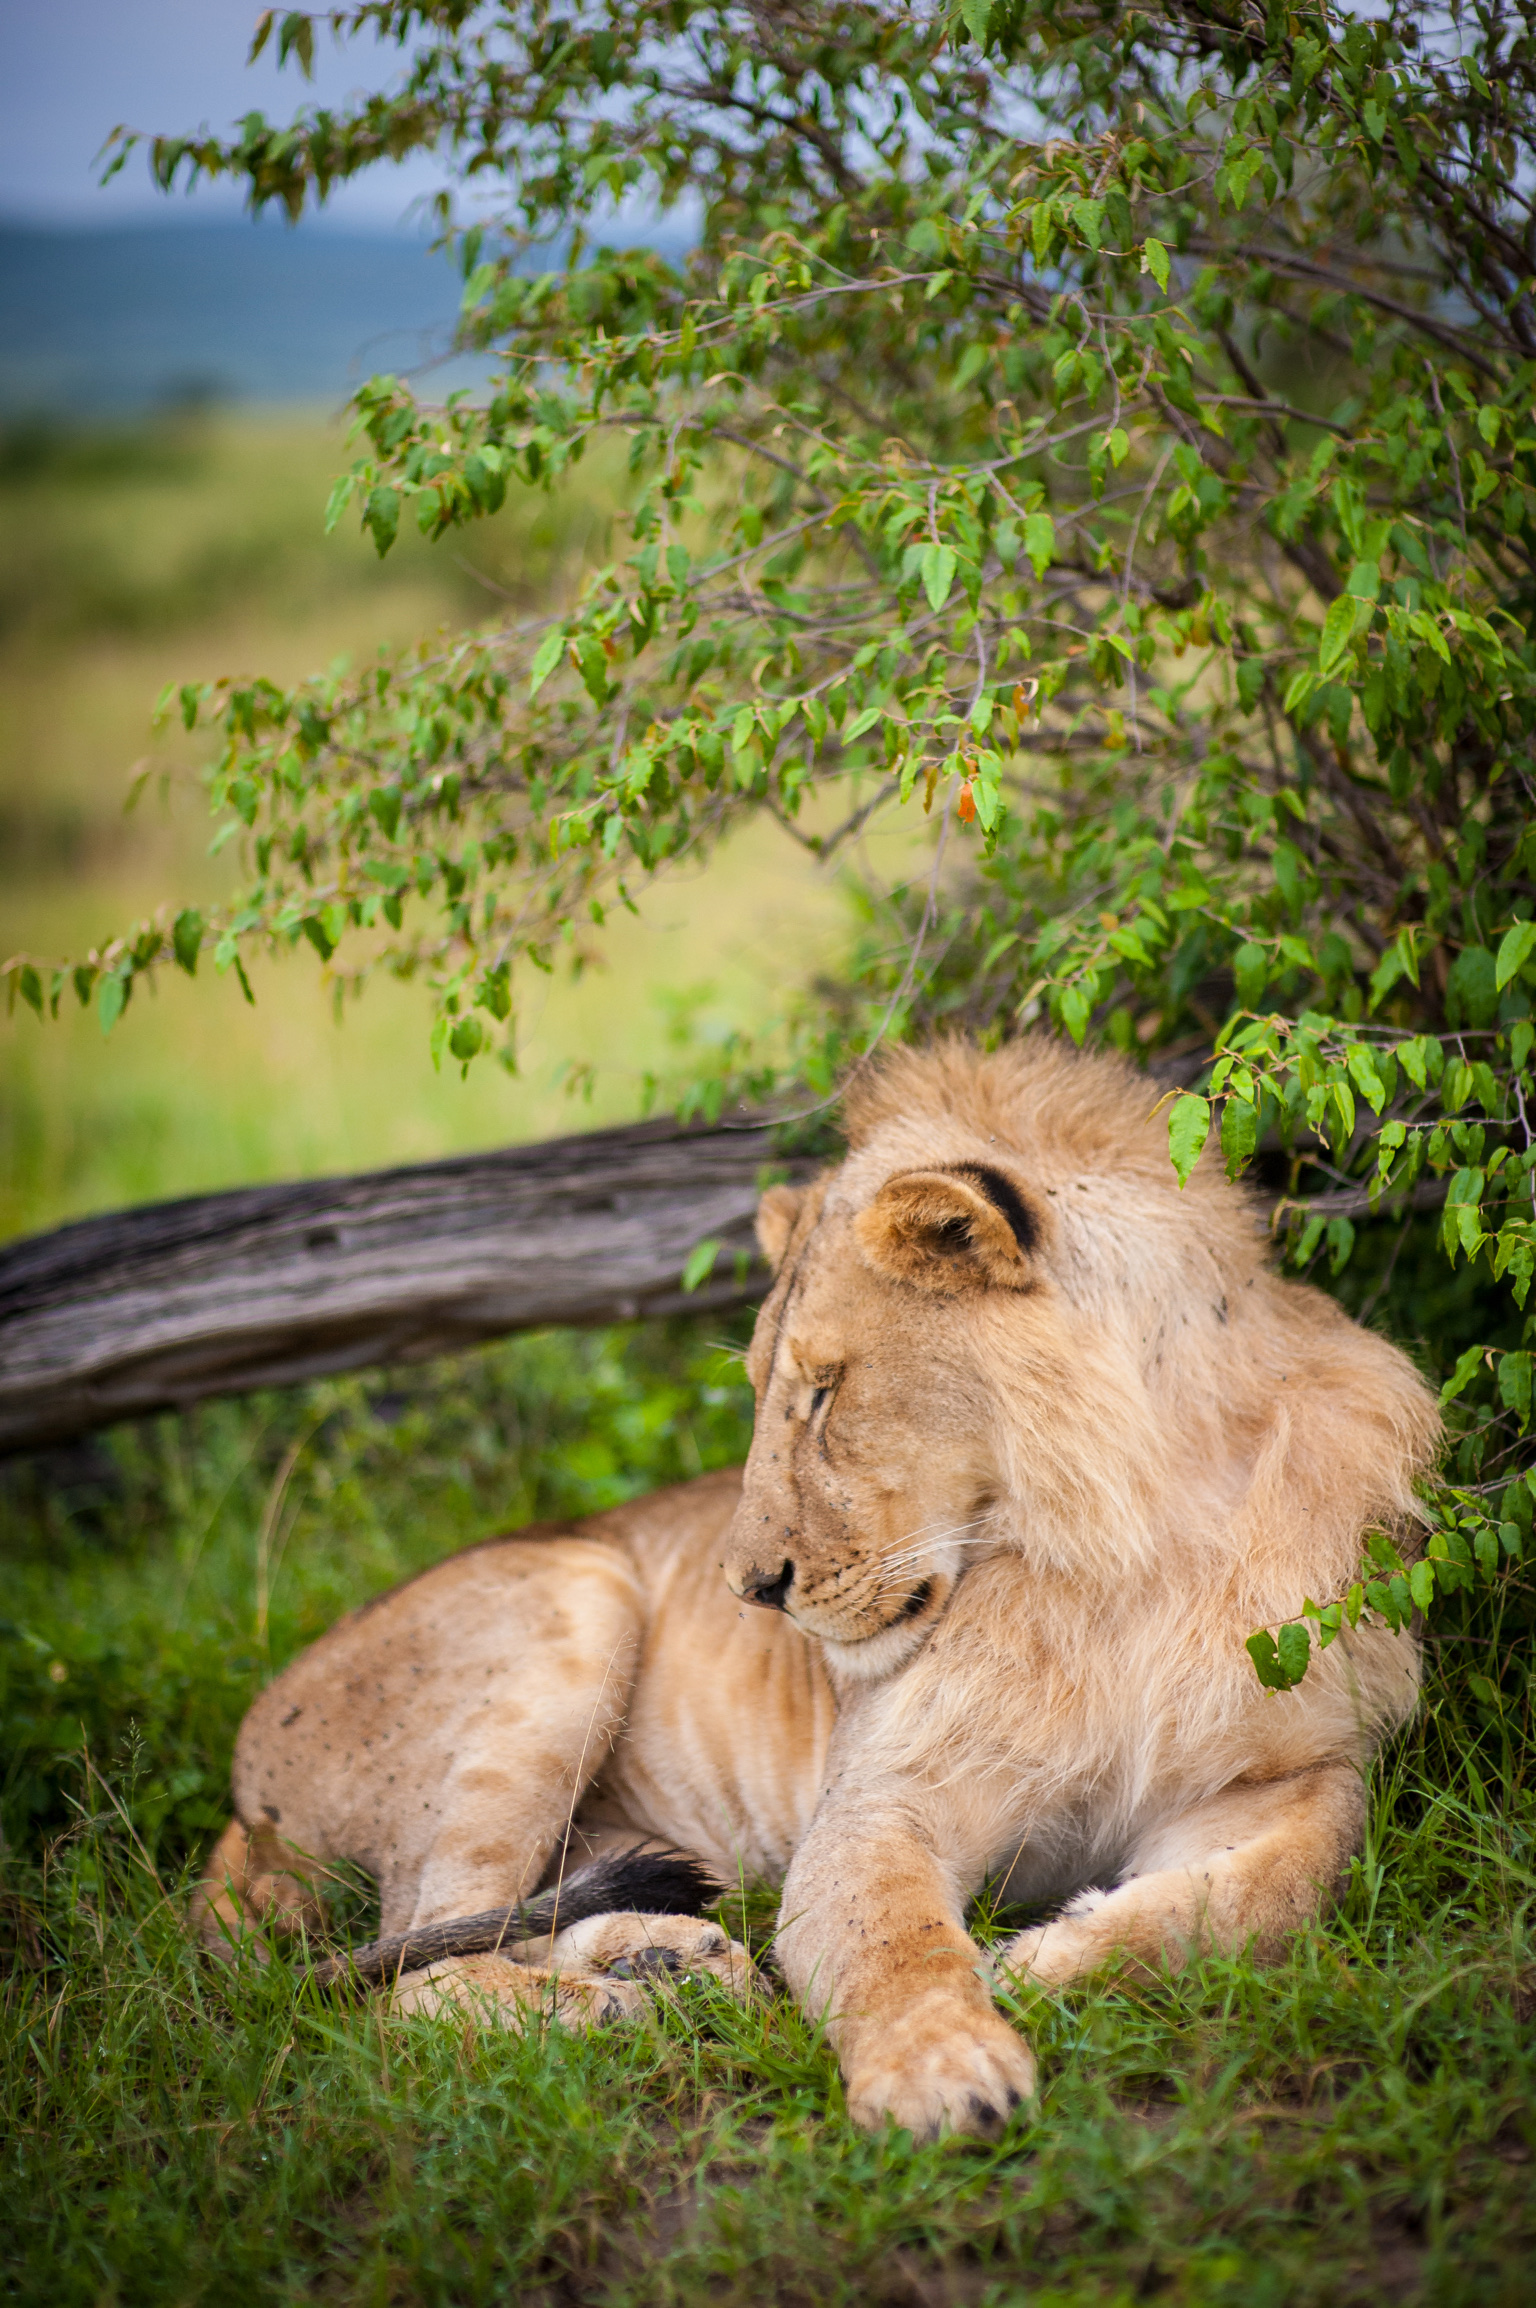 Kenya 2018 - Safari Day 4-51.jpg